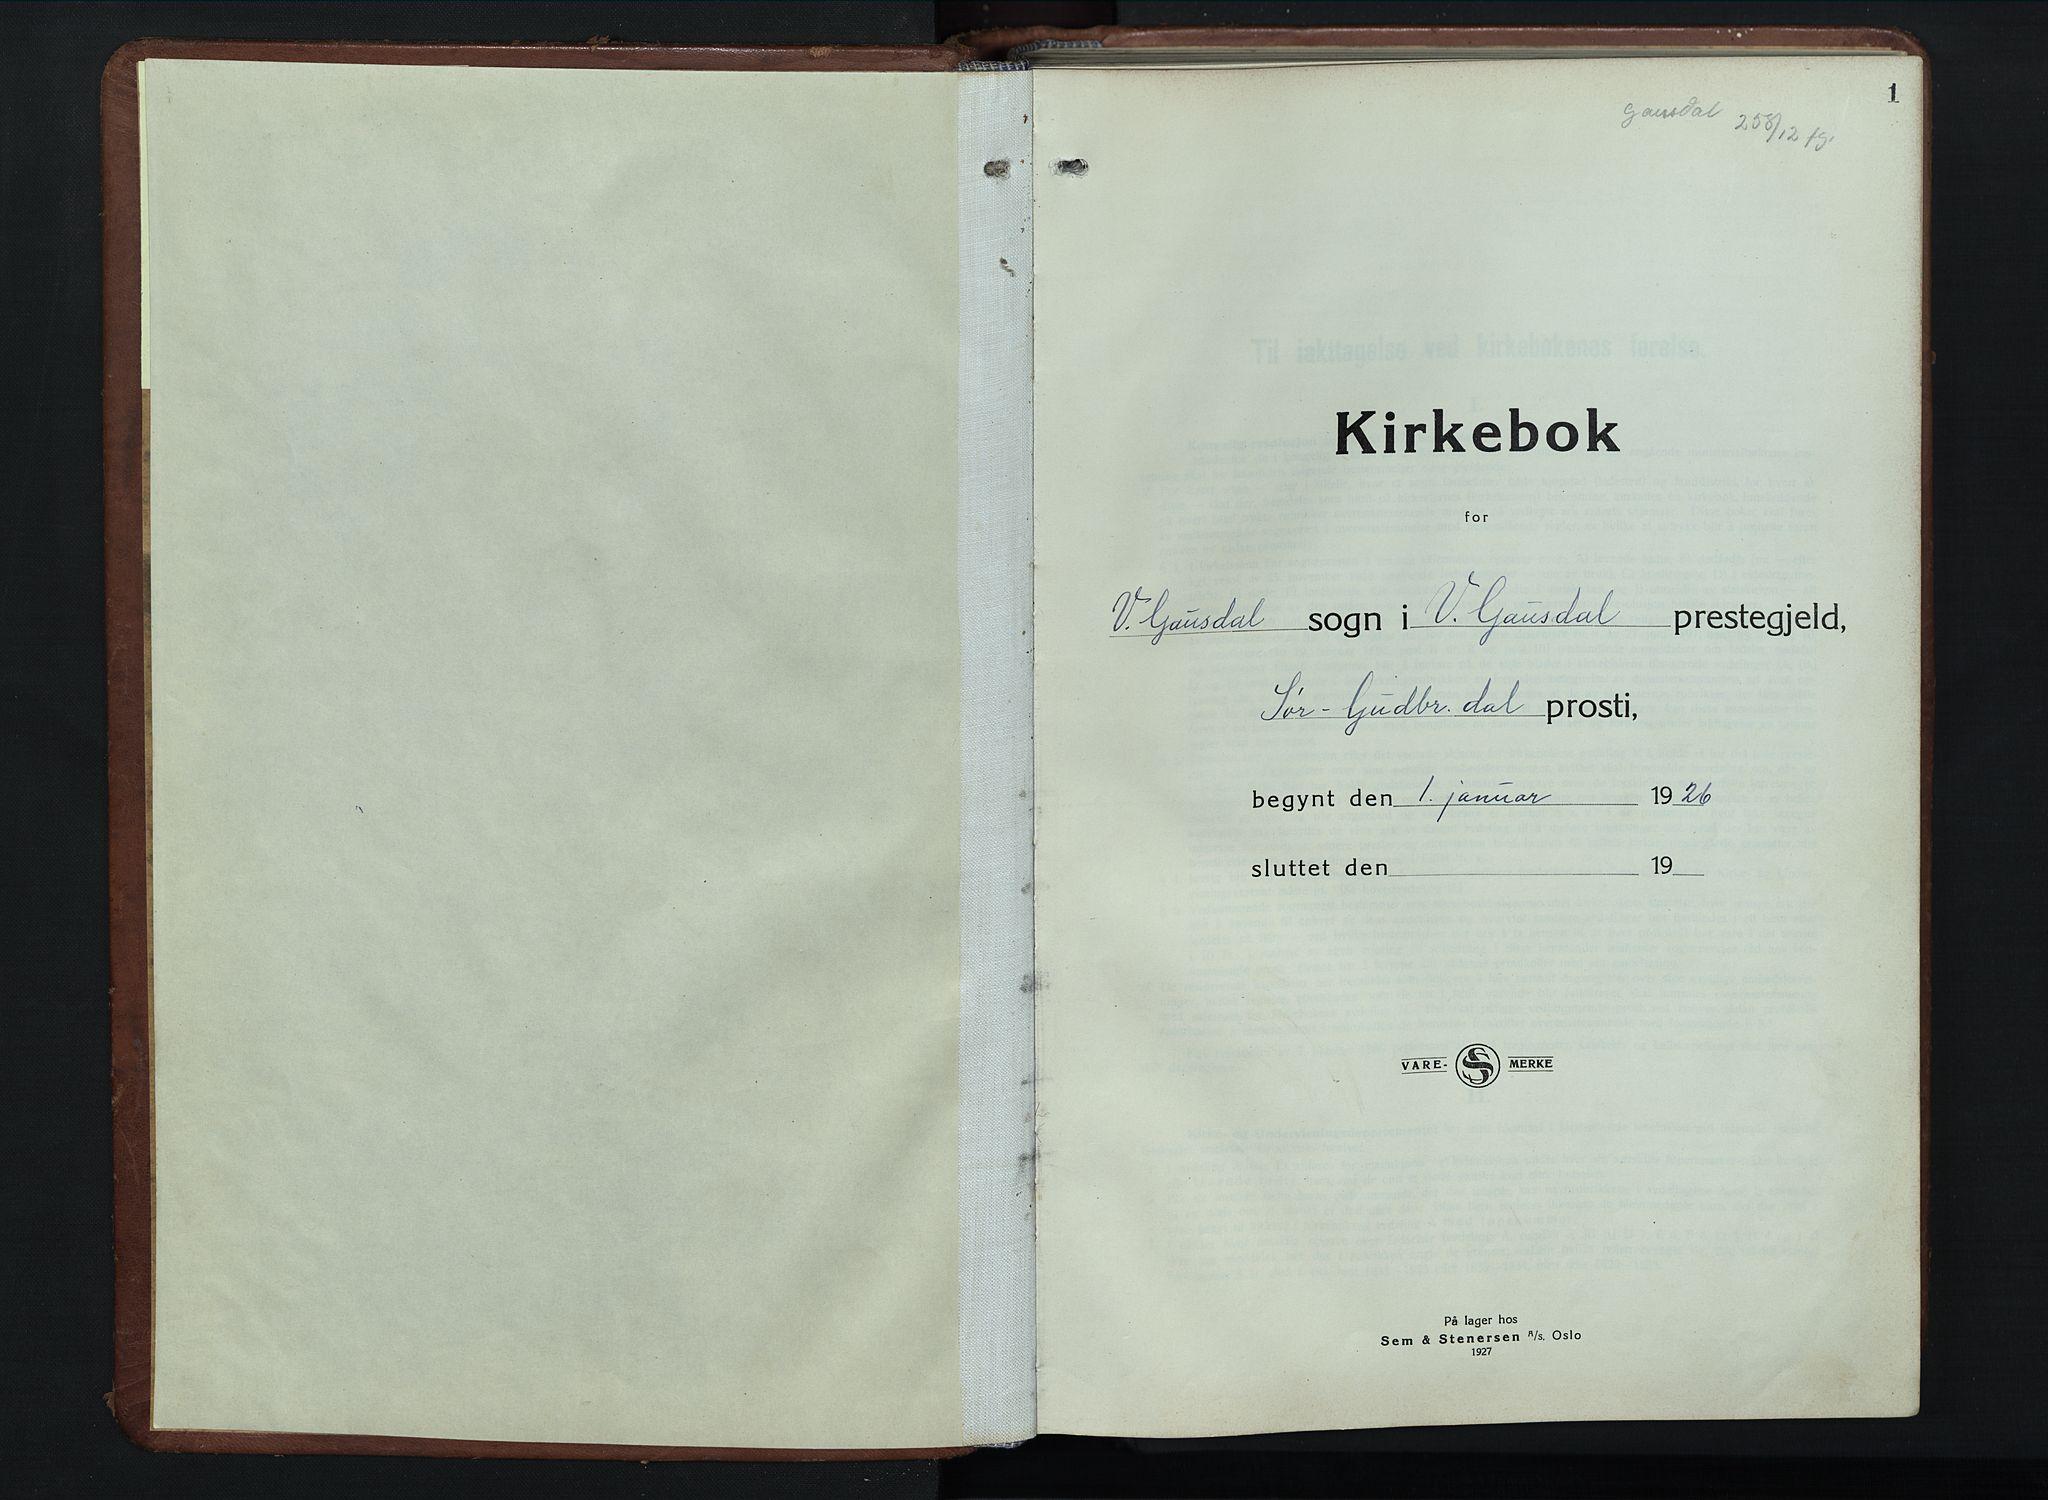 SAH, Vestre Gausdal prestekontor, Klokkerbok nr. 5, 1926-1955, s. 1